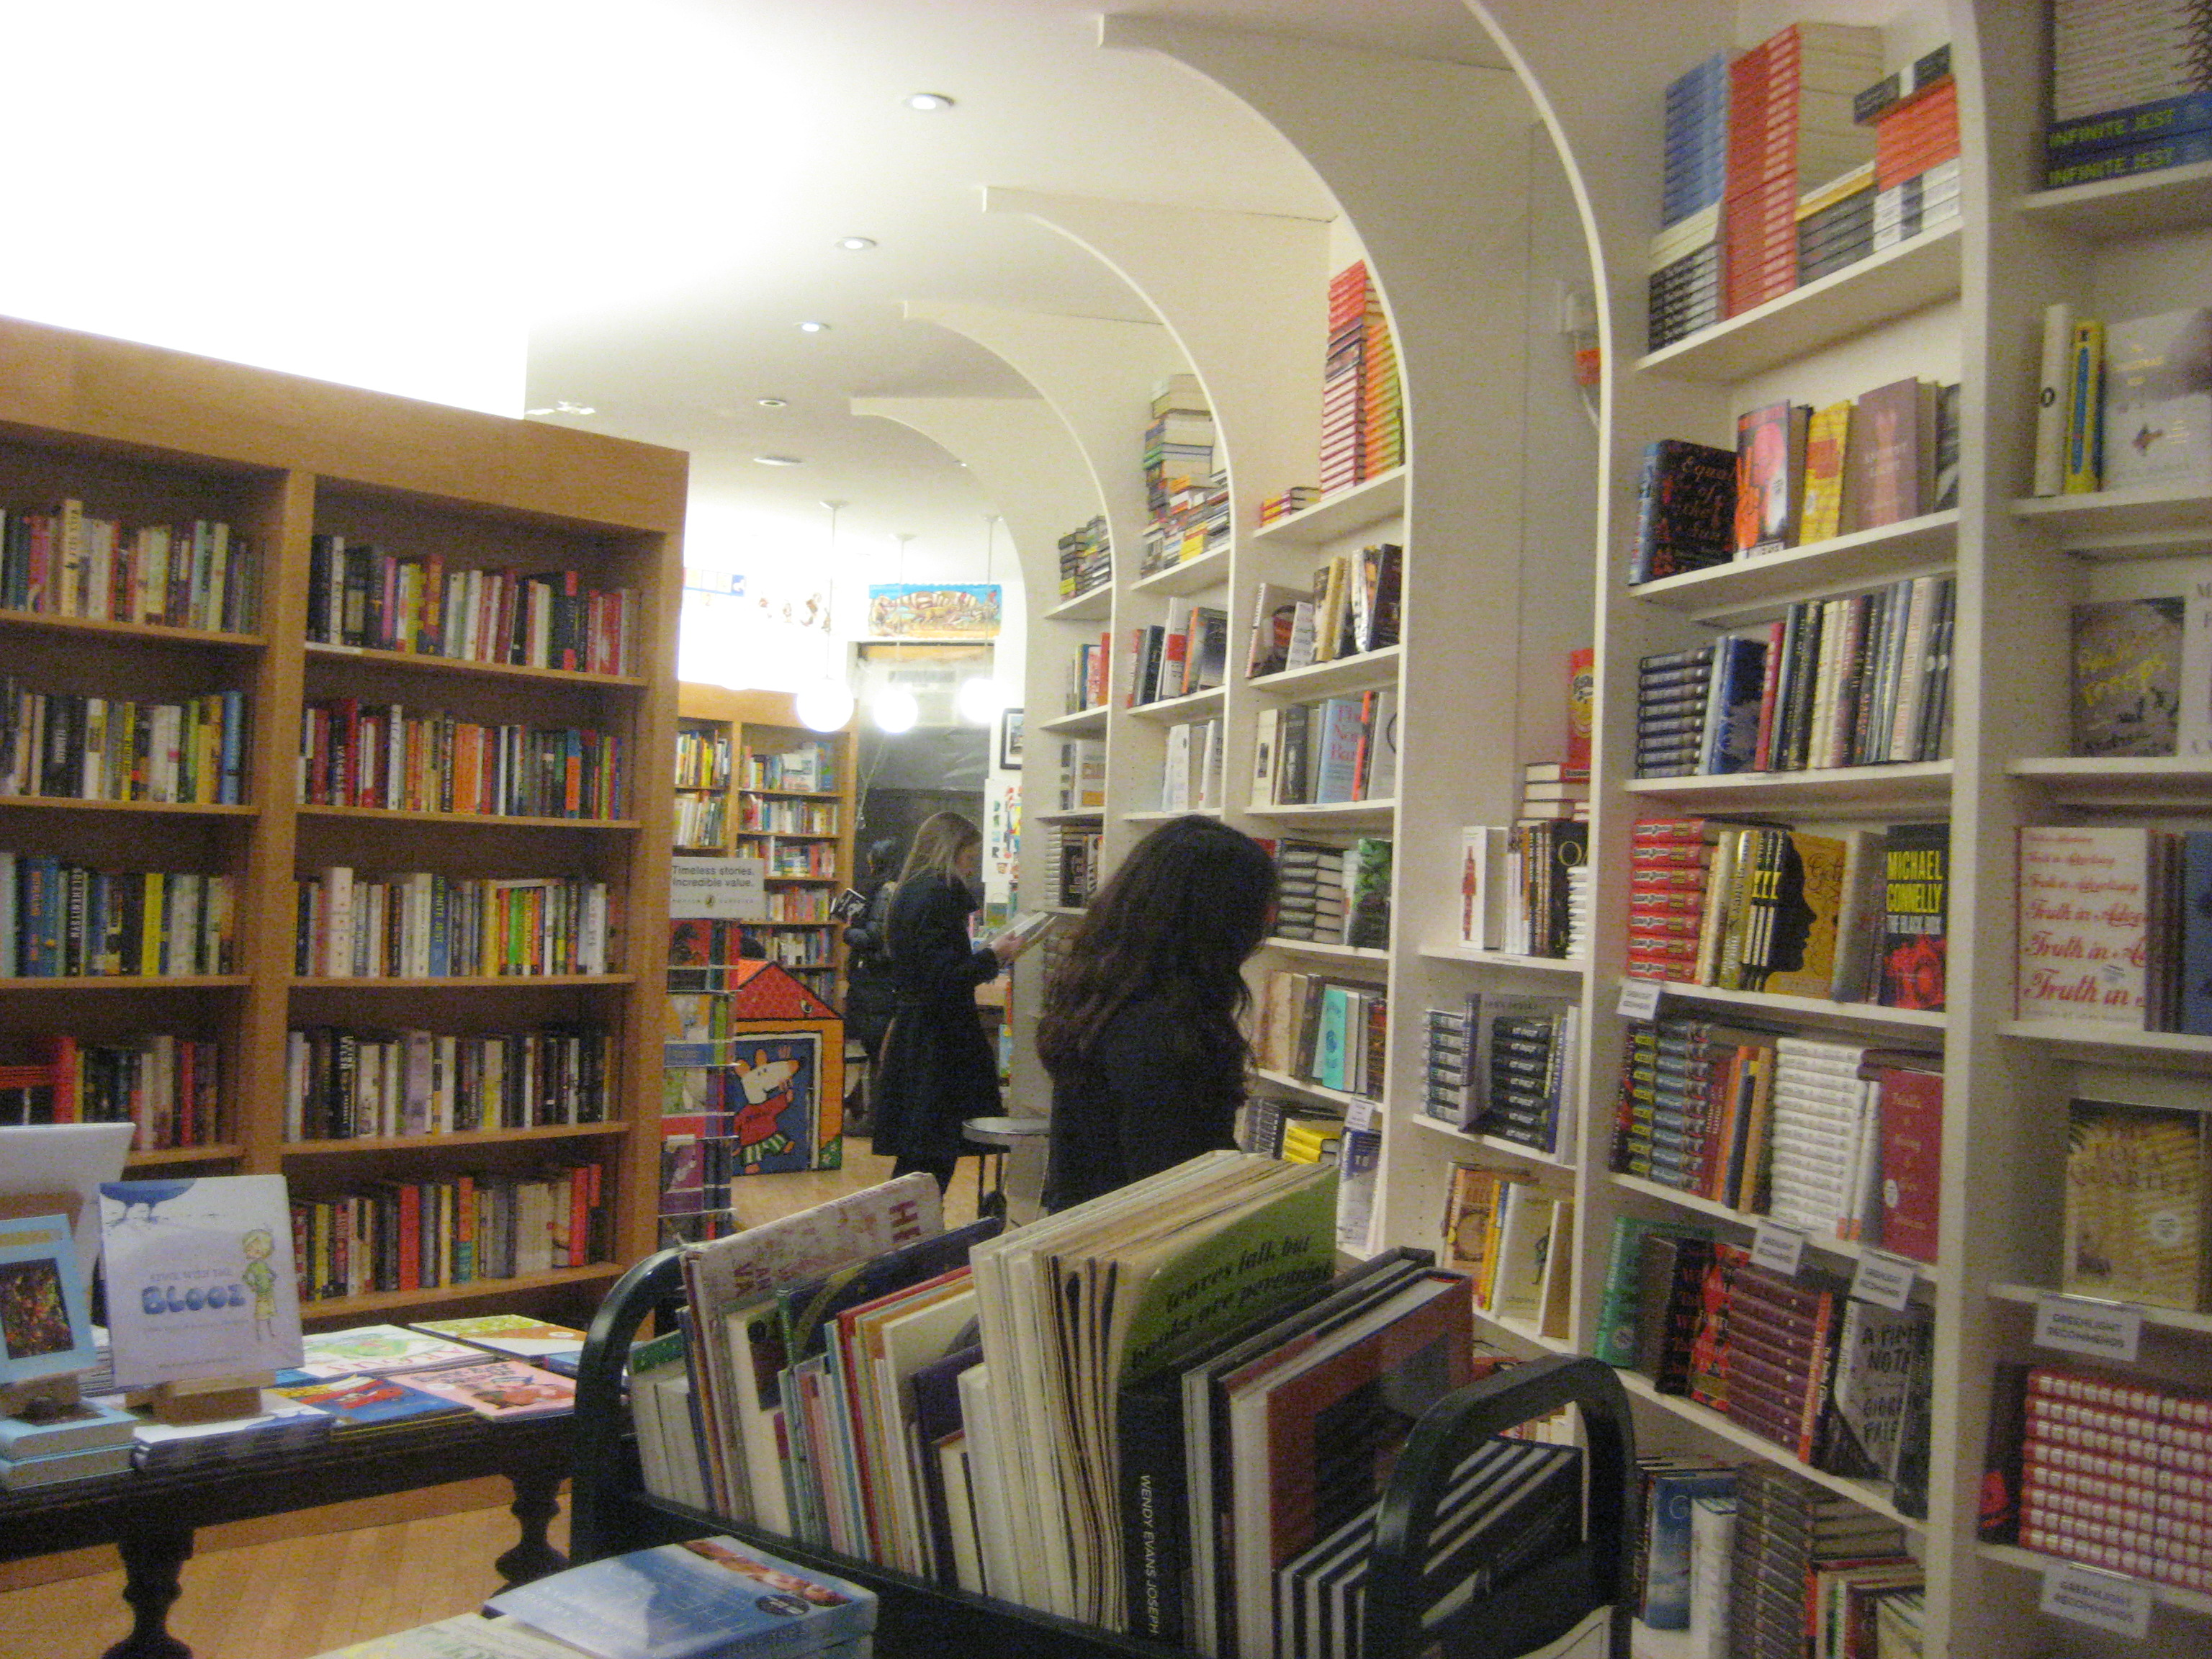 greenlight bookstore interior brooklyn